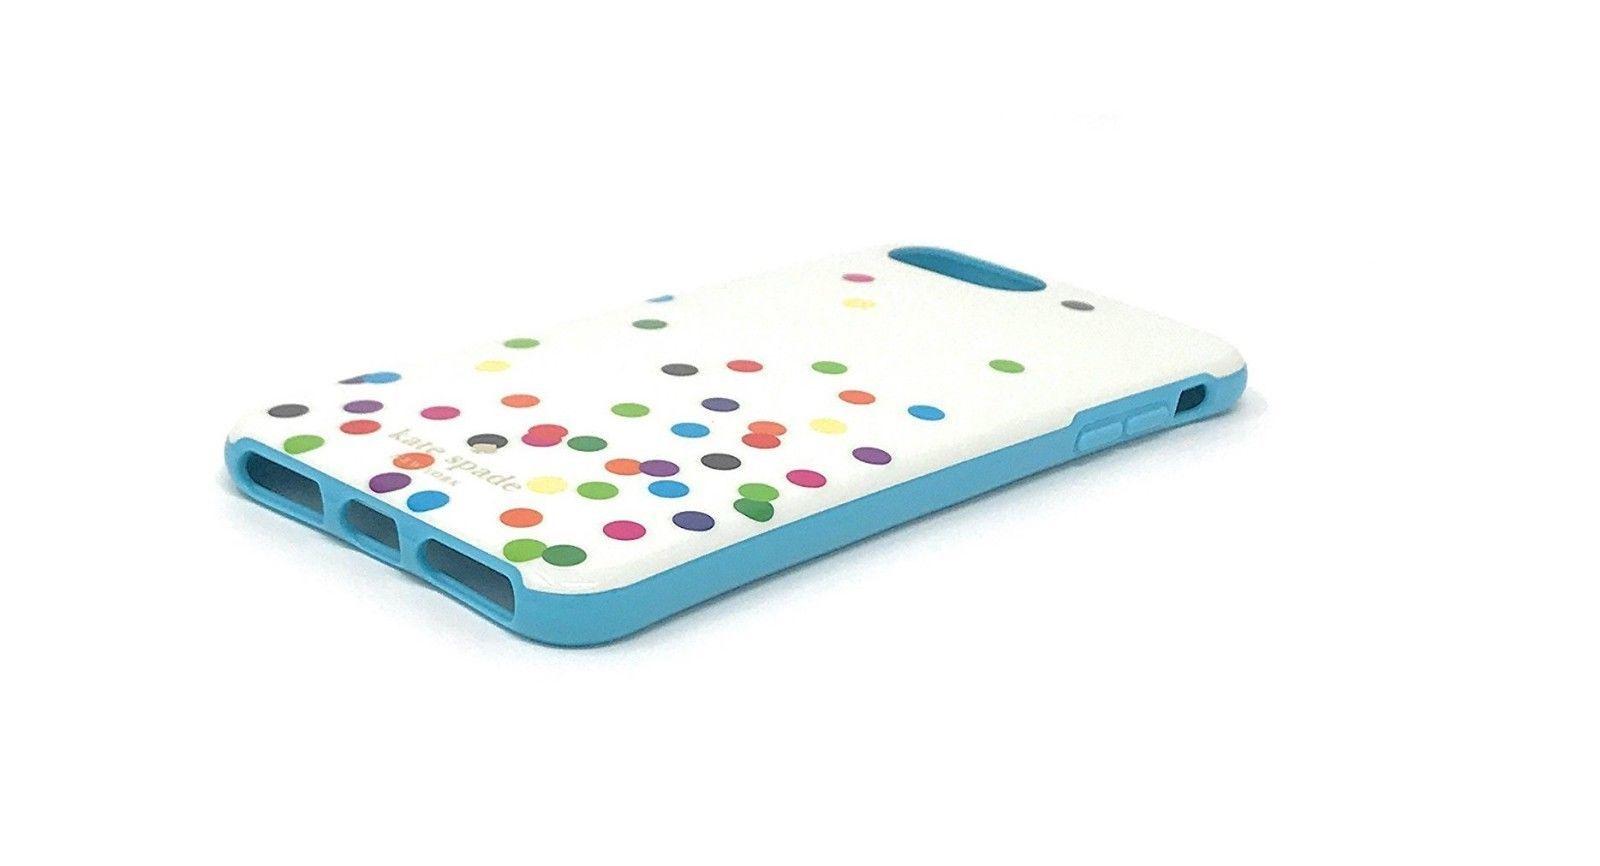 Kate Spade New York Case for iPhone 8/7 Plus/6s PLUS - Confetti Dots Multi-Color image 3